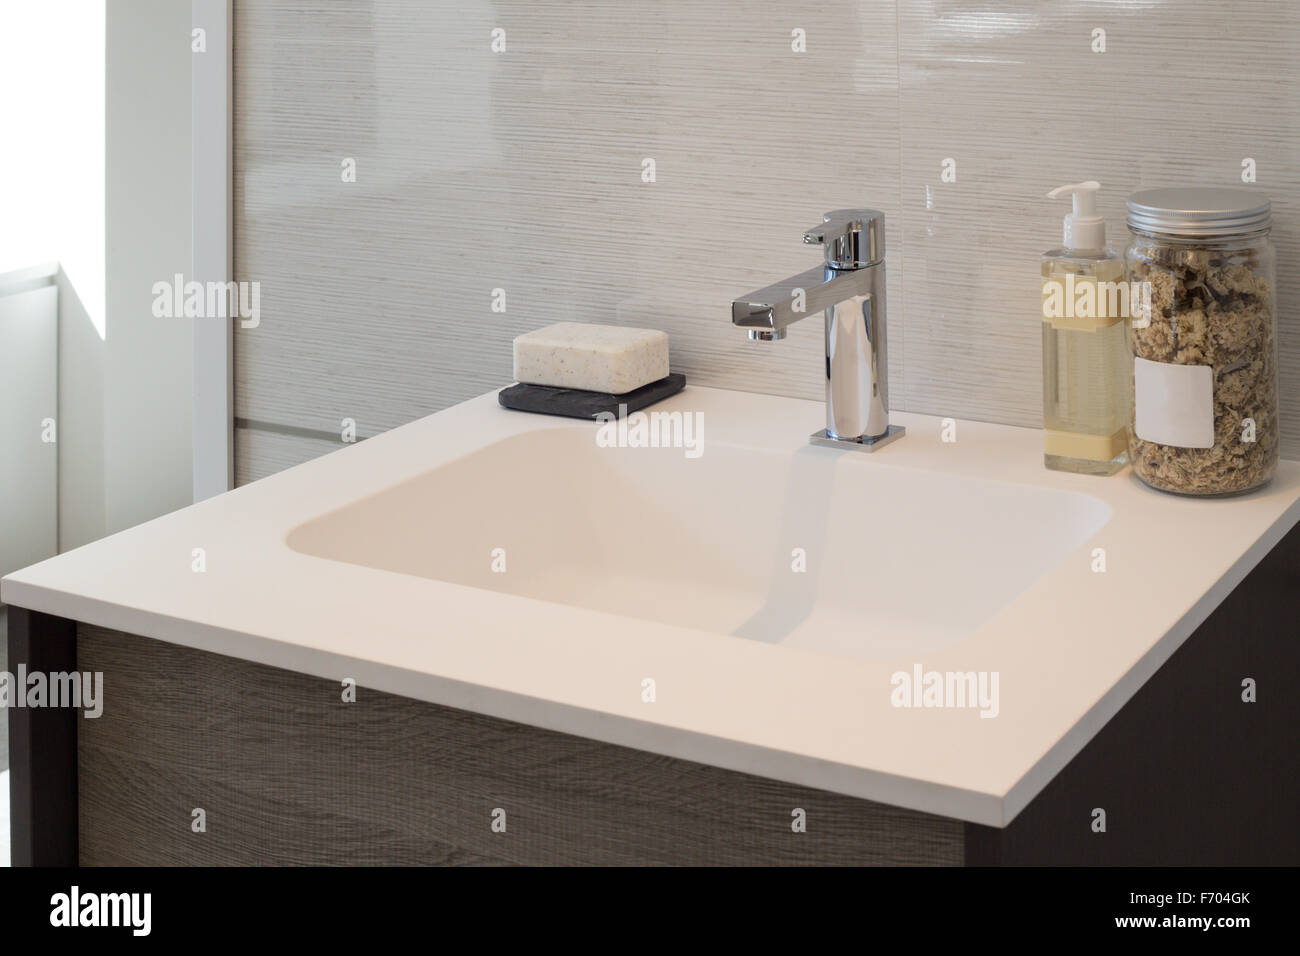 Clean contemporary bathroom sink Stock Photo